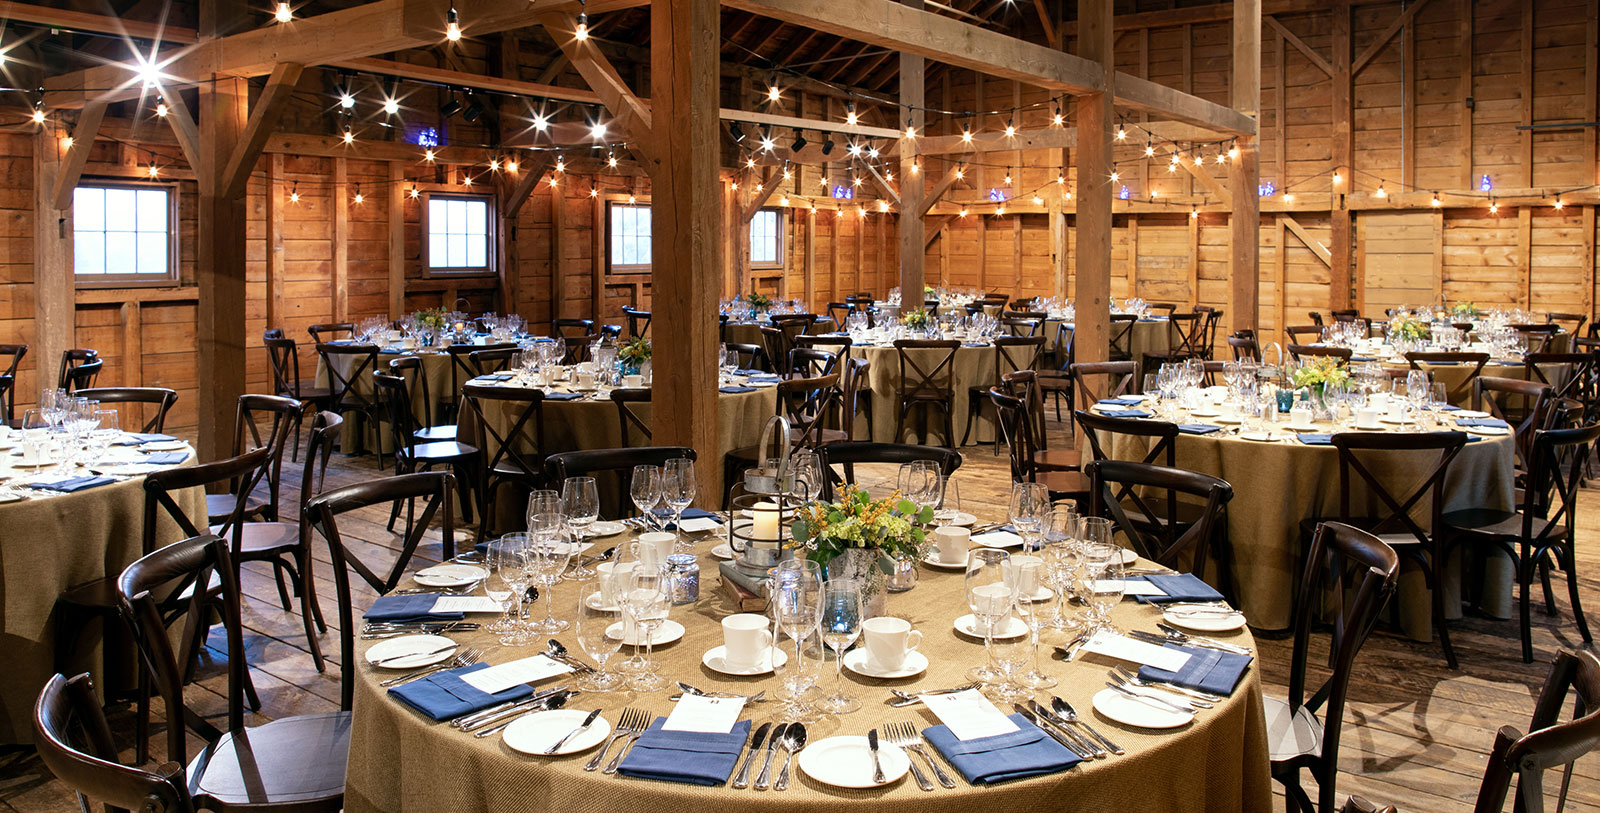 Image of Event Dining Wedding, The Woodstock Inn & Resort, 1793, Member of Historic Hotels of America, in Woodstock, Vermont, Weddings